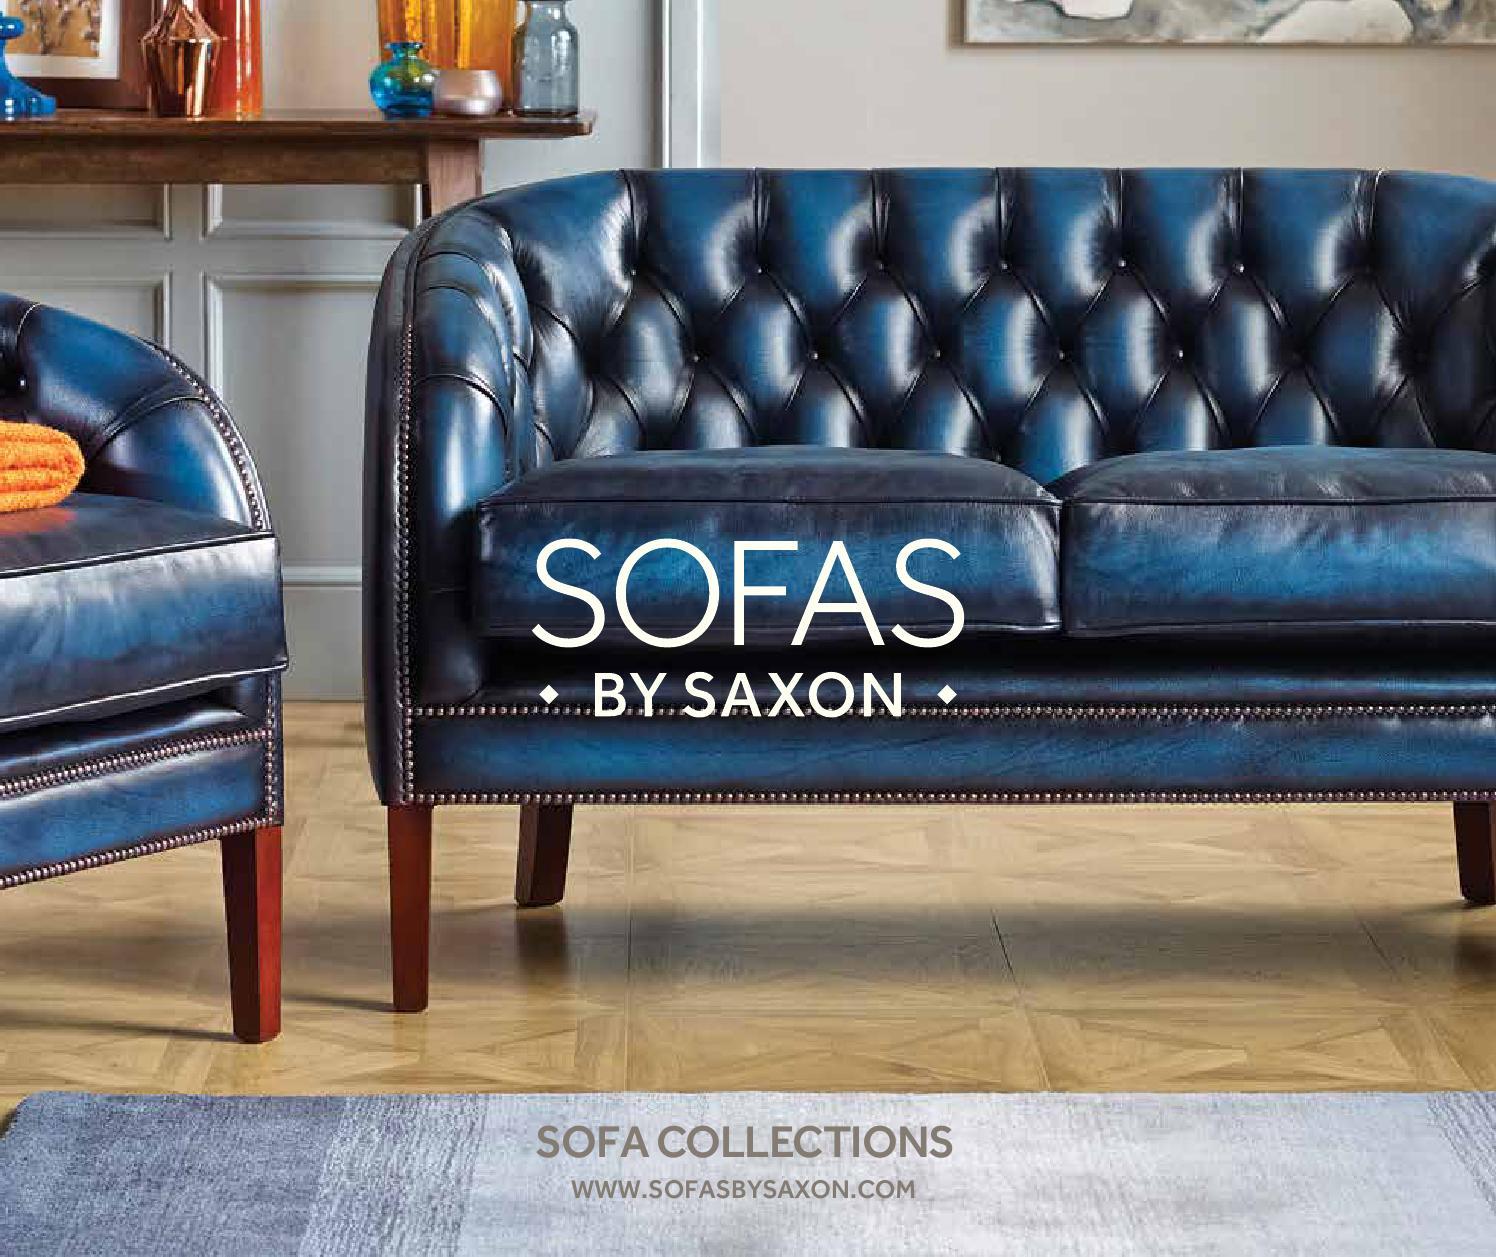 sofas by saxon brochure 2015 by saxon furniture ltd issuu. Black Bedroom Furniture Sets. Home Design Ideas